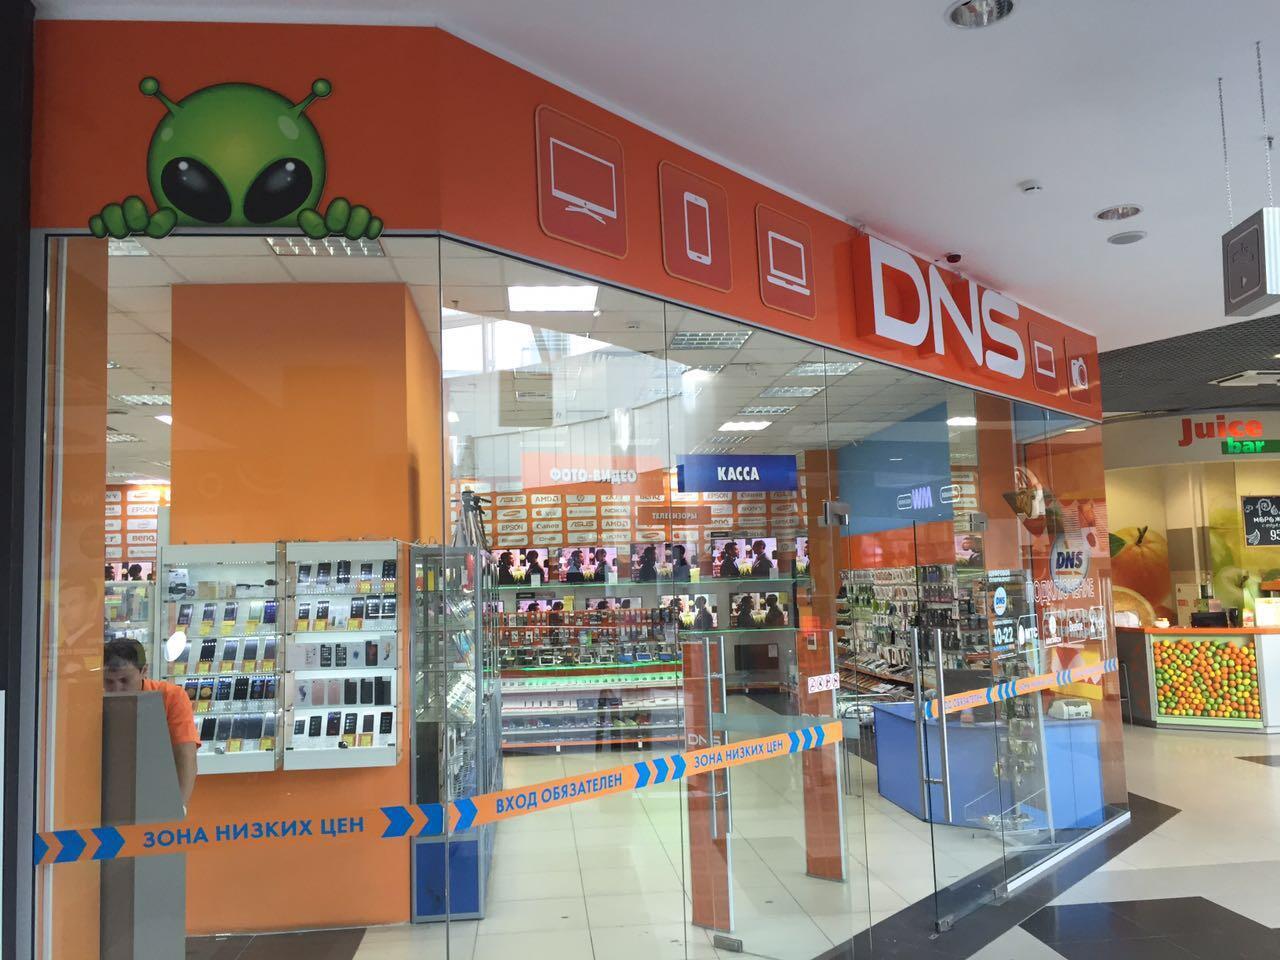 Курган – магазин DNS ТРЦ «Пушкинский»   адрес, телефон, часы работы ... 2105dbc436e